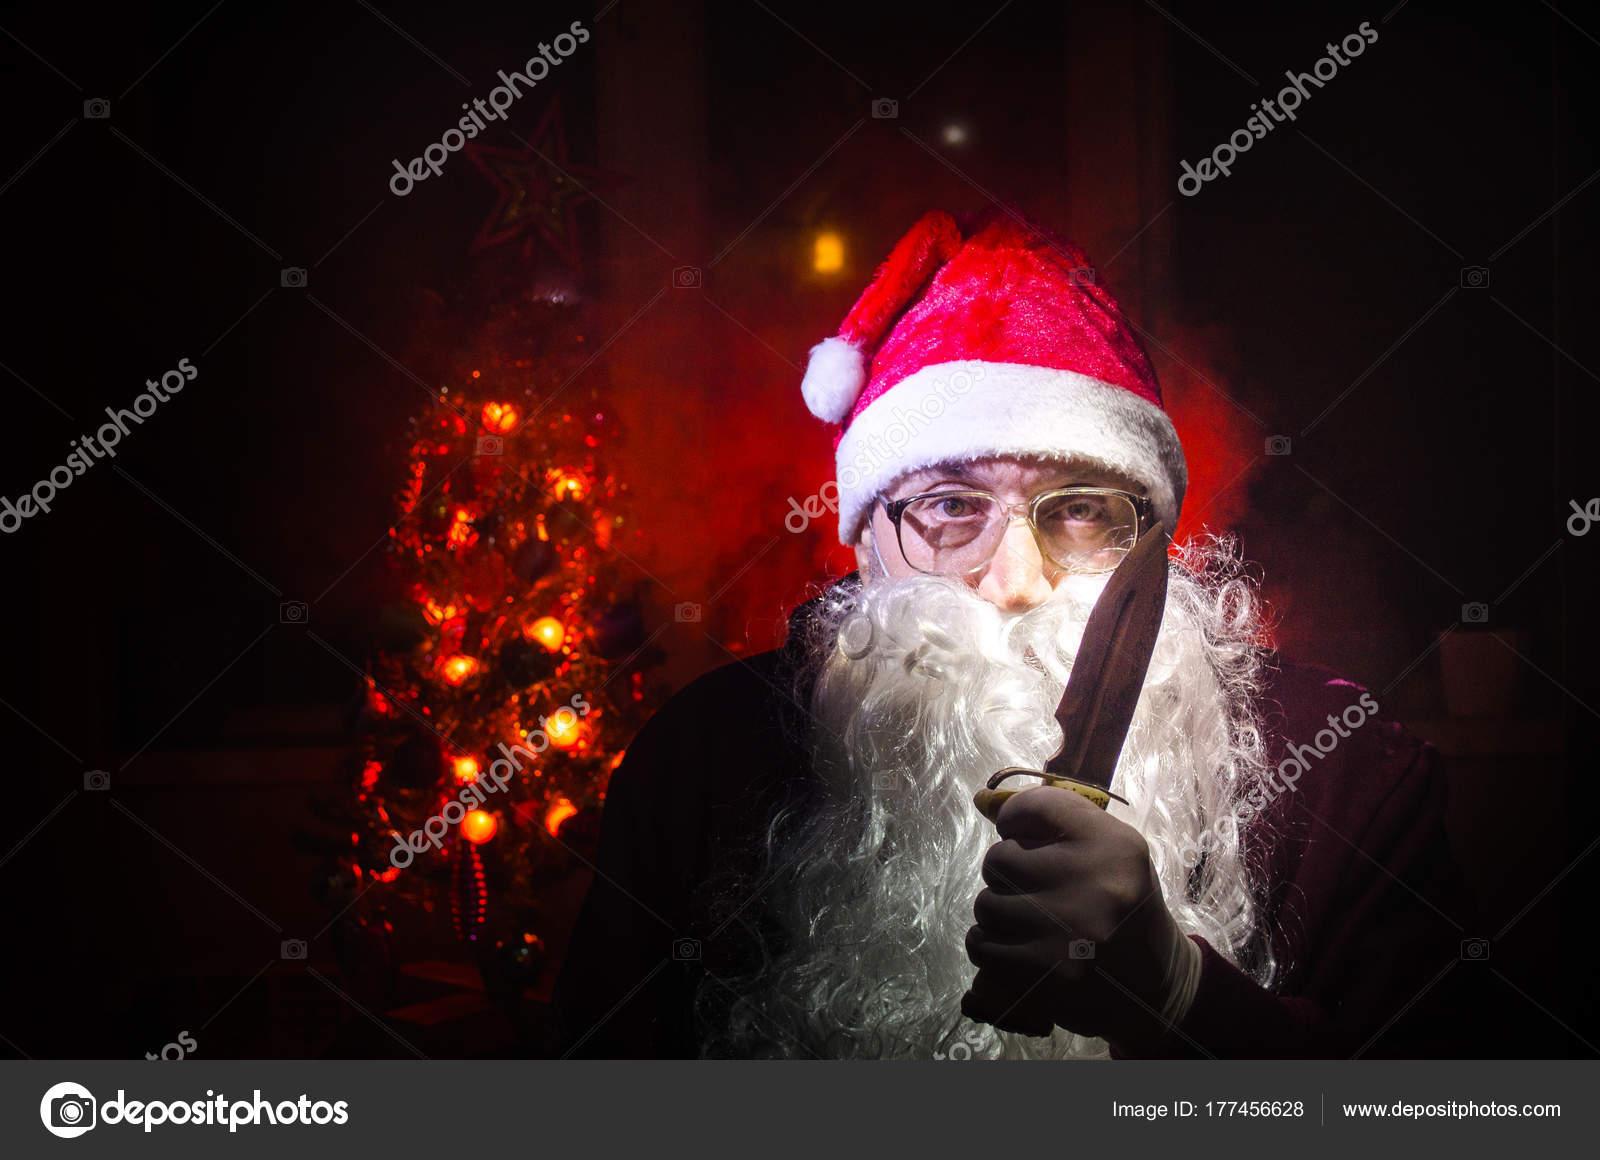 Babbo Natale Assassino.Babbo Natale Assassino Campobassopellicce